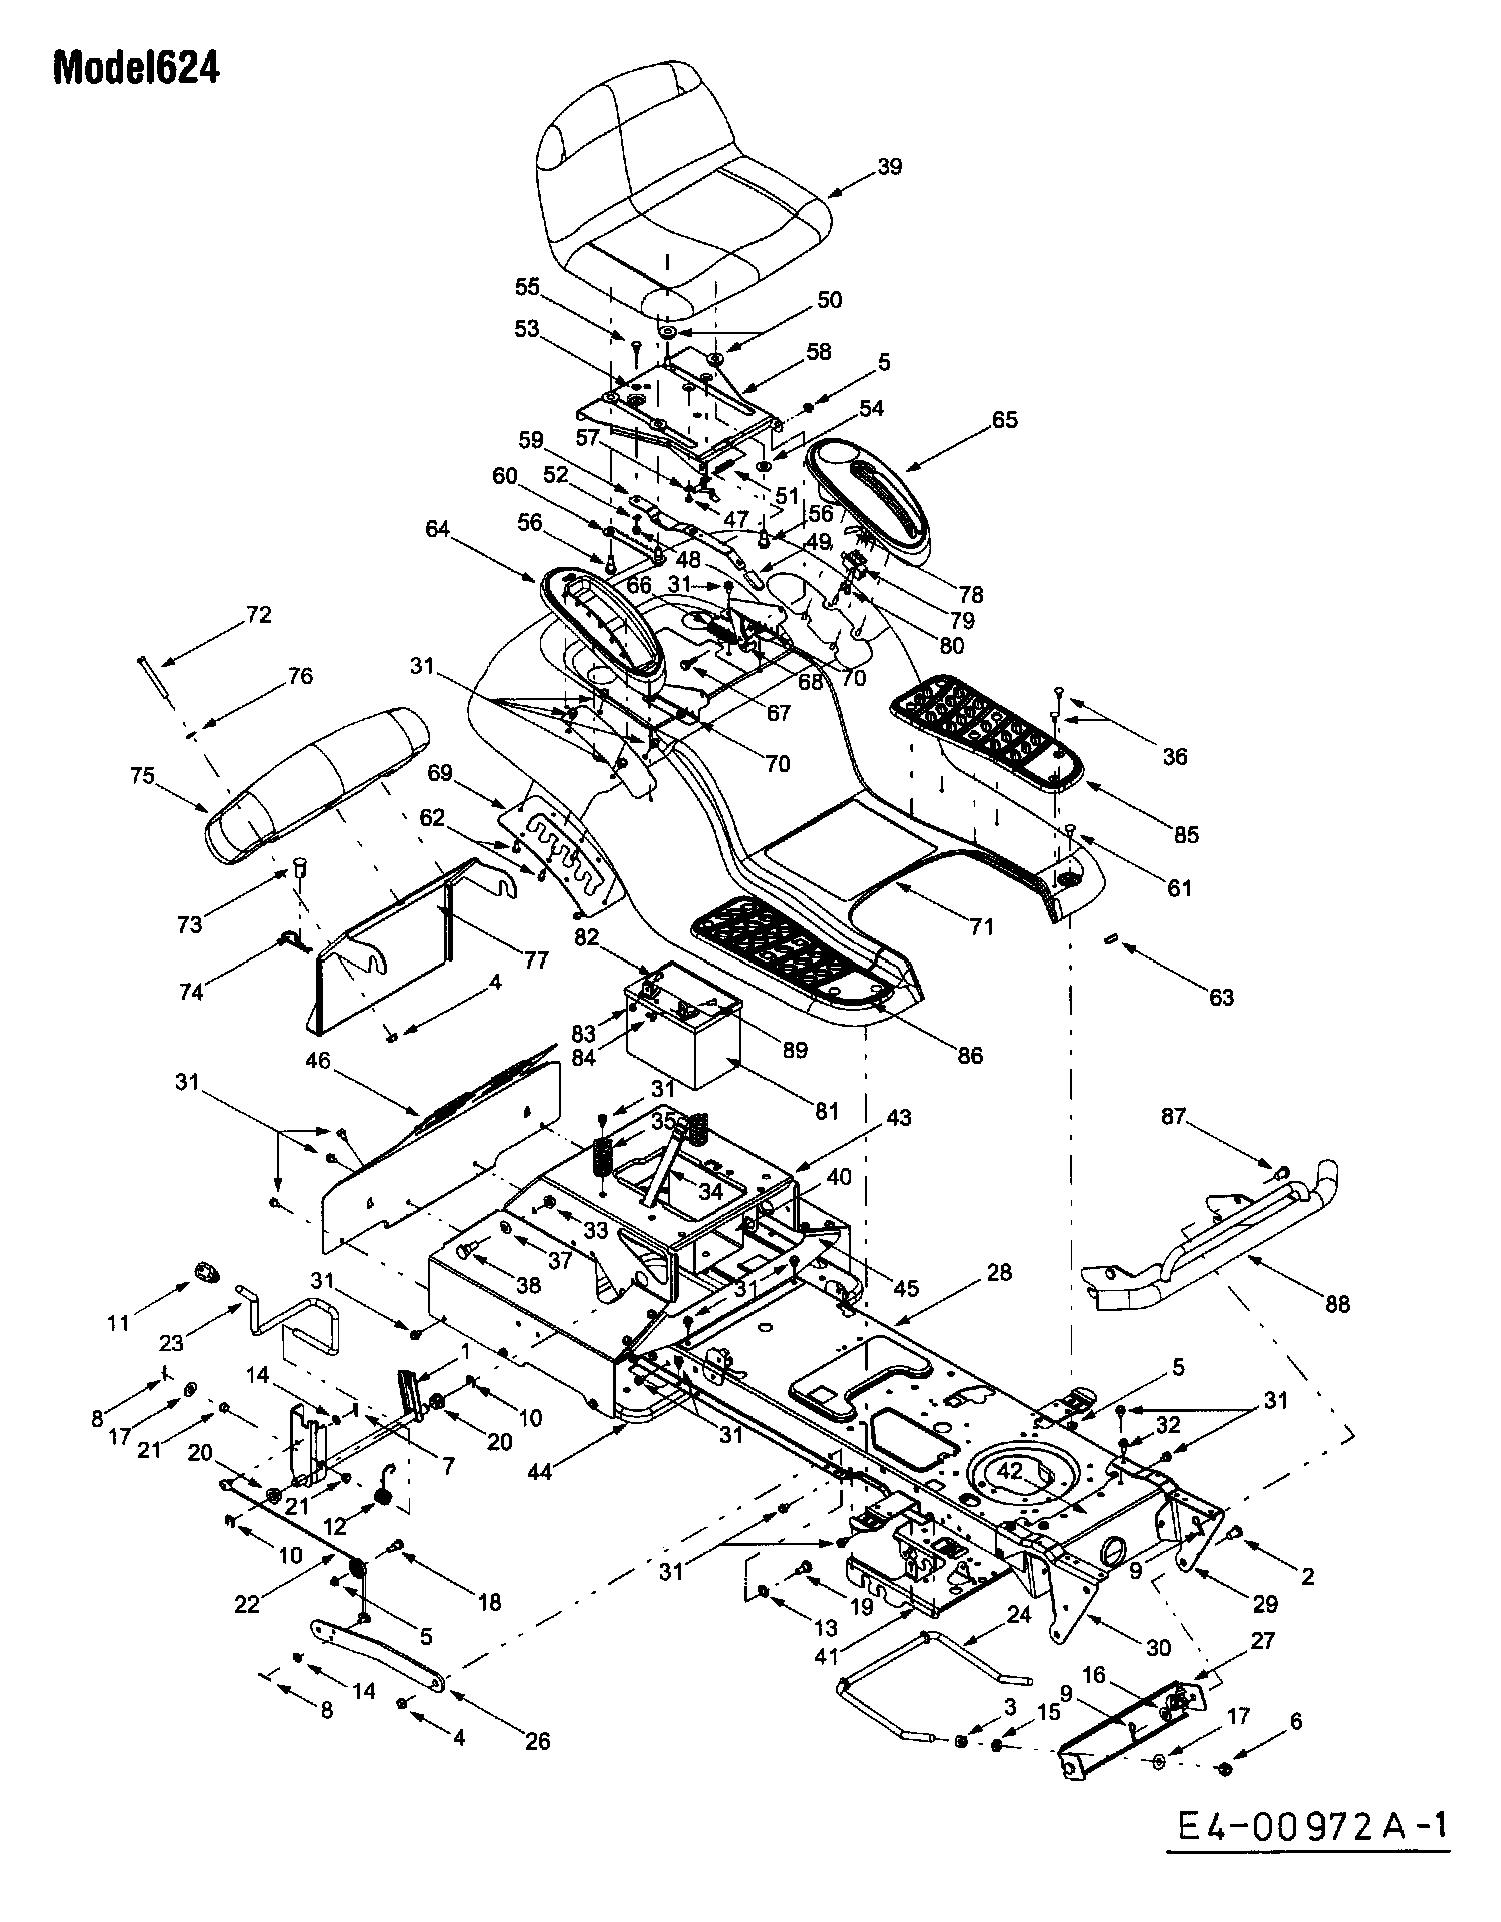 small resolution of nissan 280zx wiring diagram imageresizertool com datsun 280zx engine diagram 240sx wiring diagram